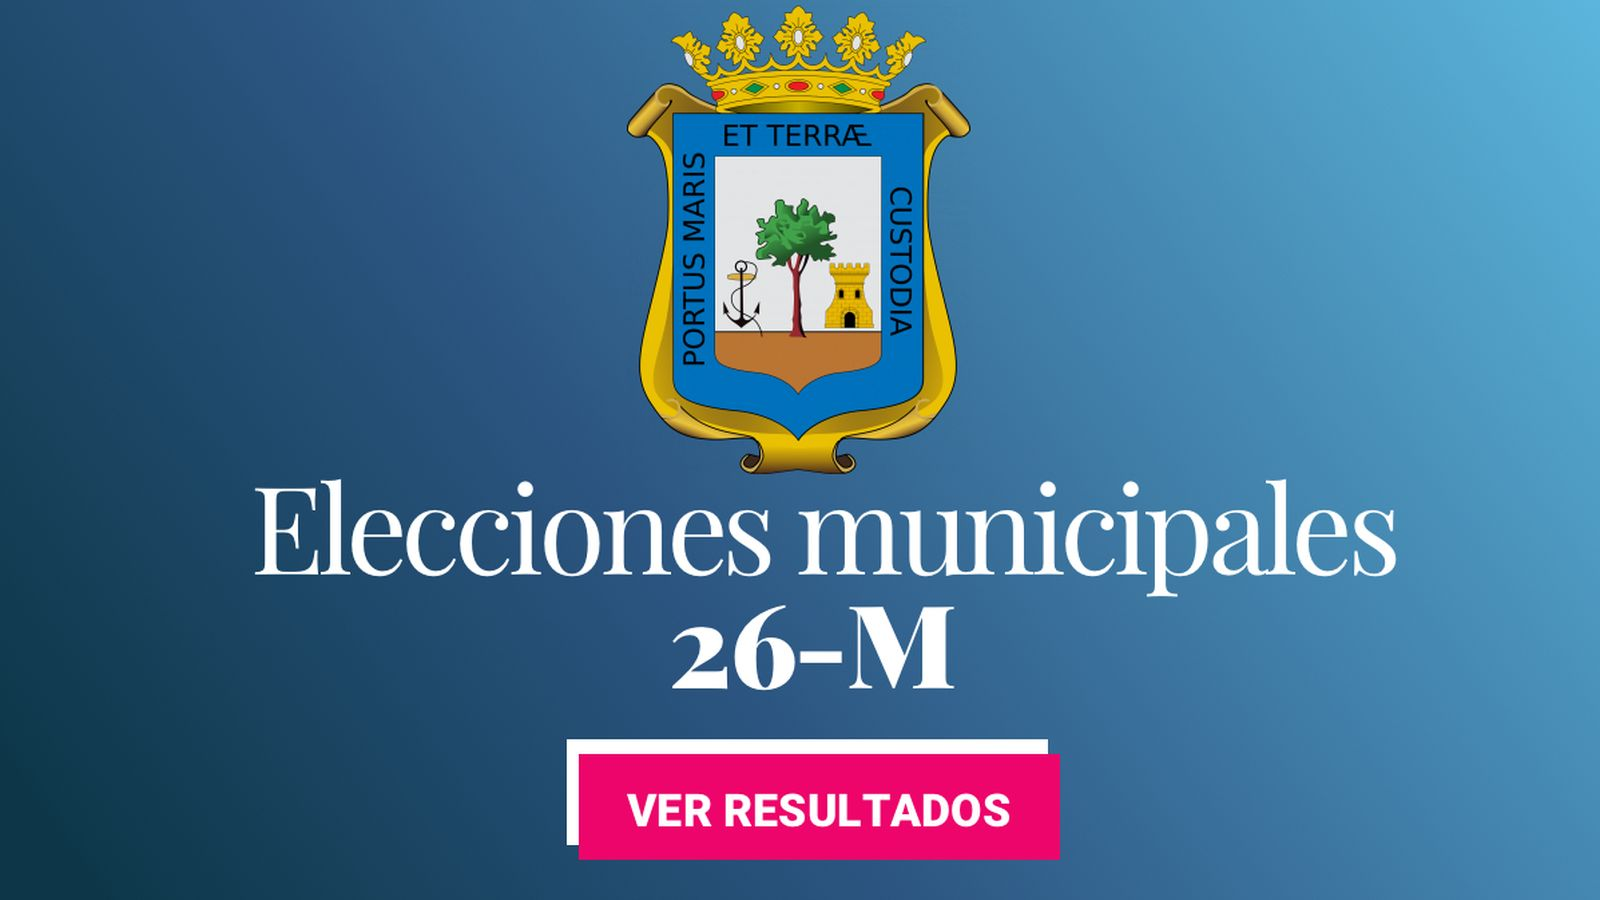 Foto: Elecciones municipales 2019 en Huelva. (C.C./EC)